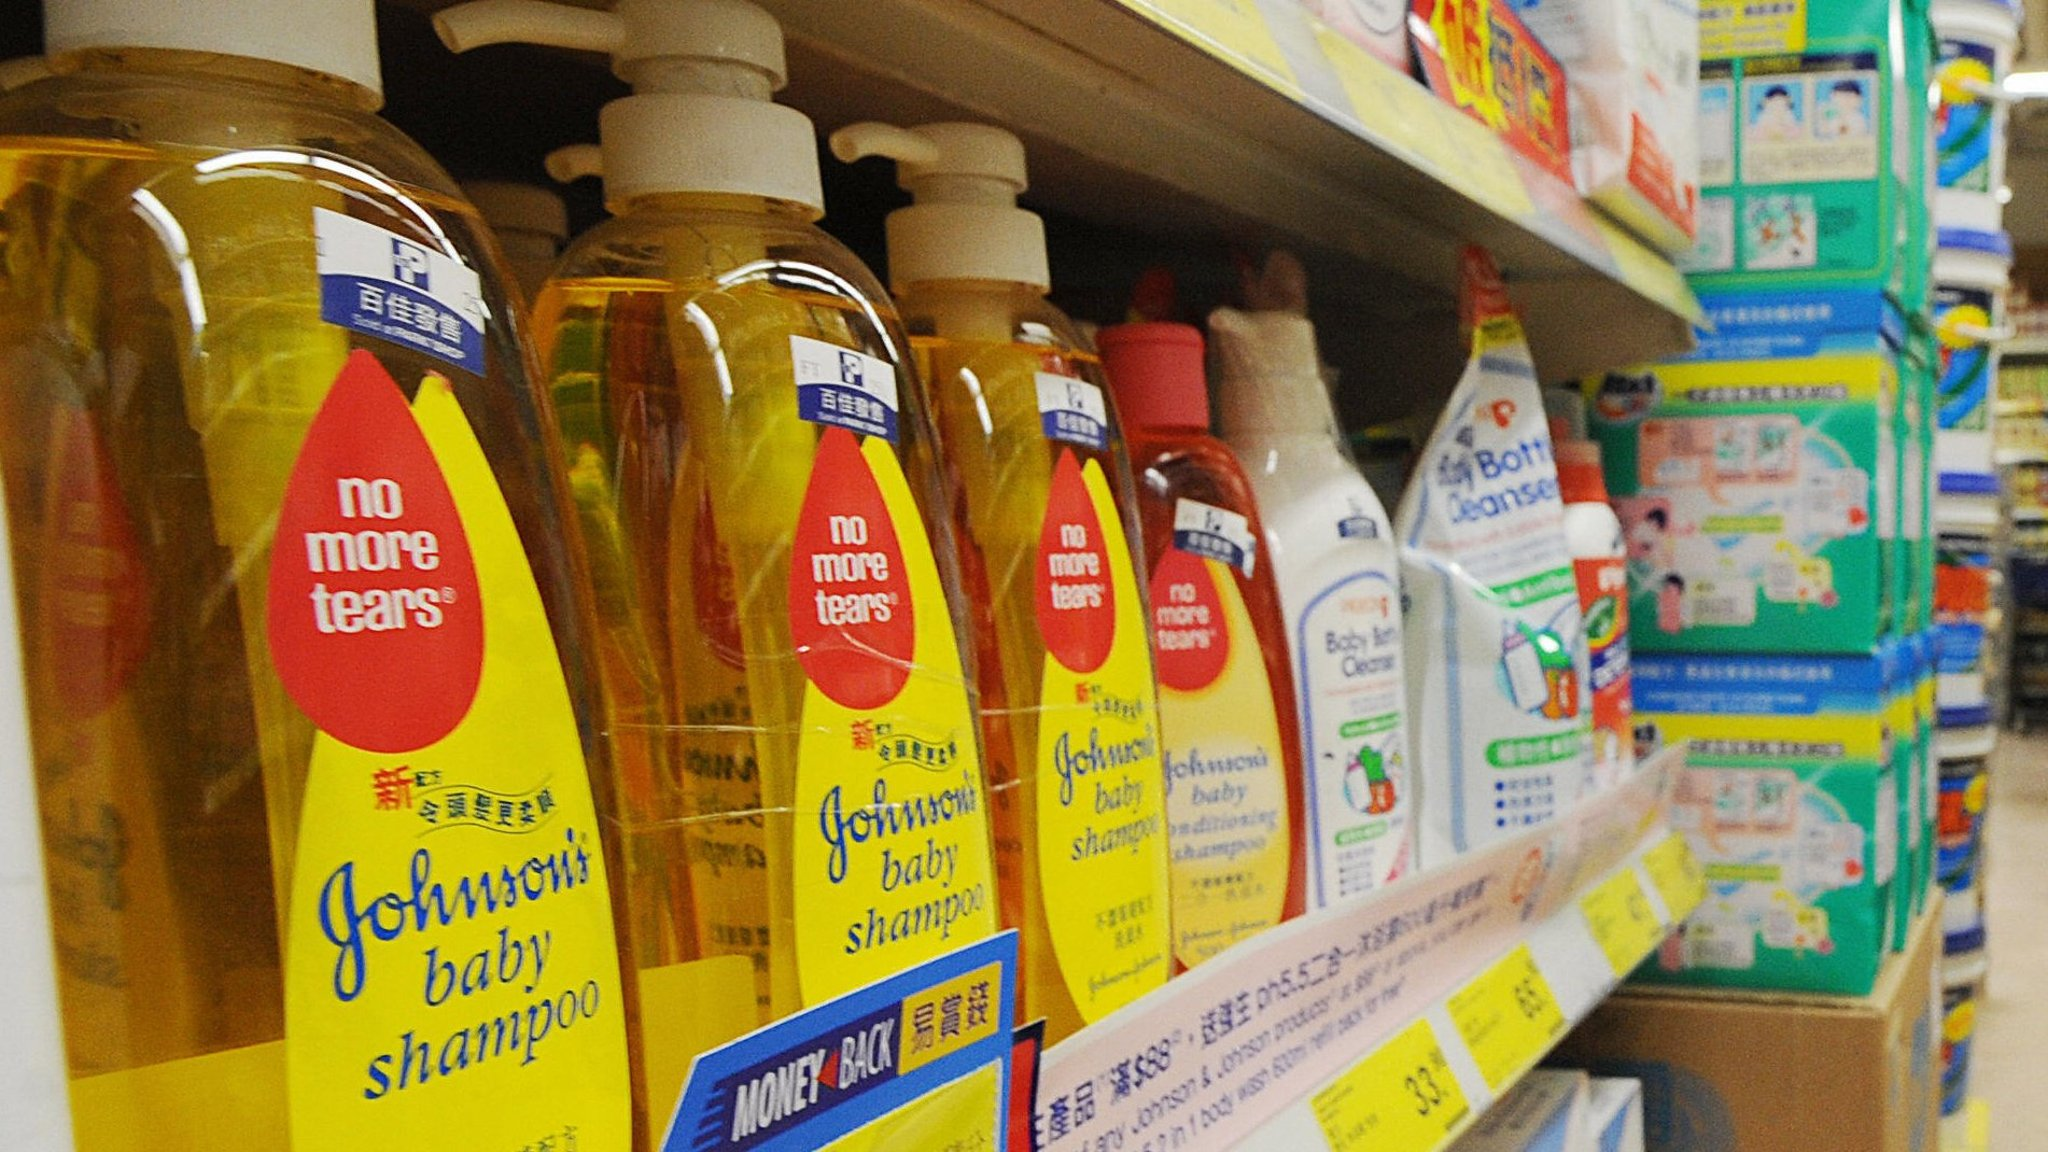 Jnj My Store >> J J To Relaunch Baby Brand As Millennials Go Organic